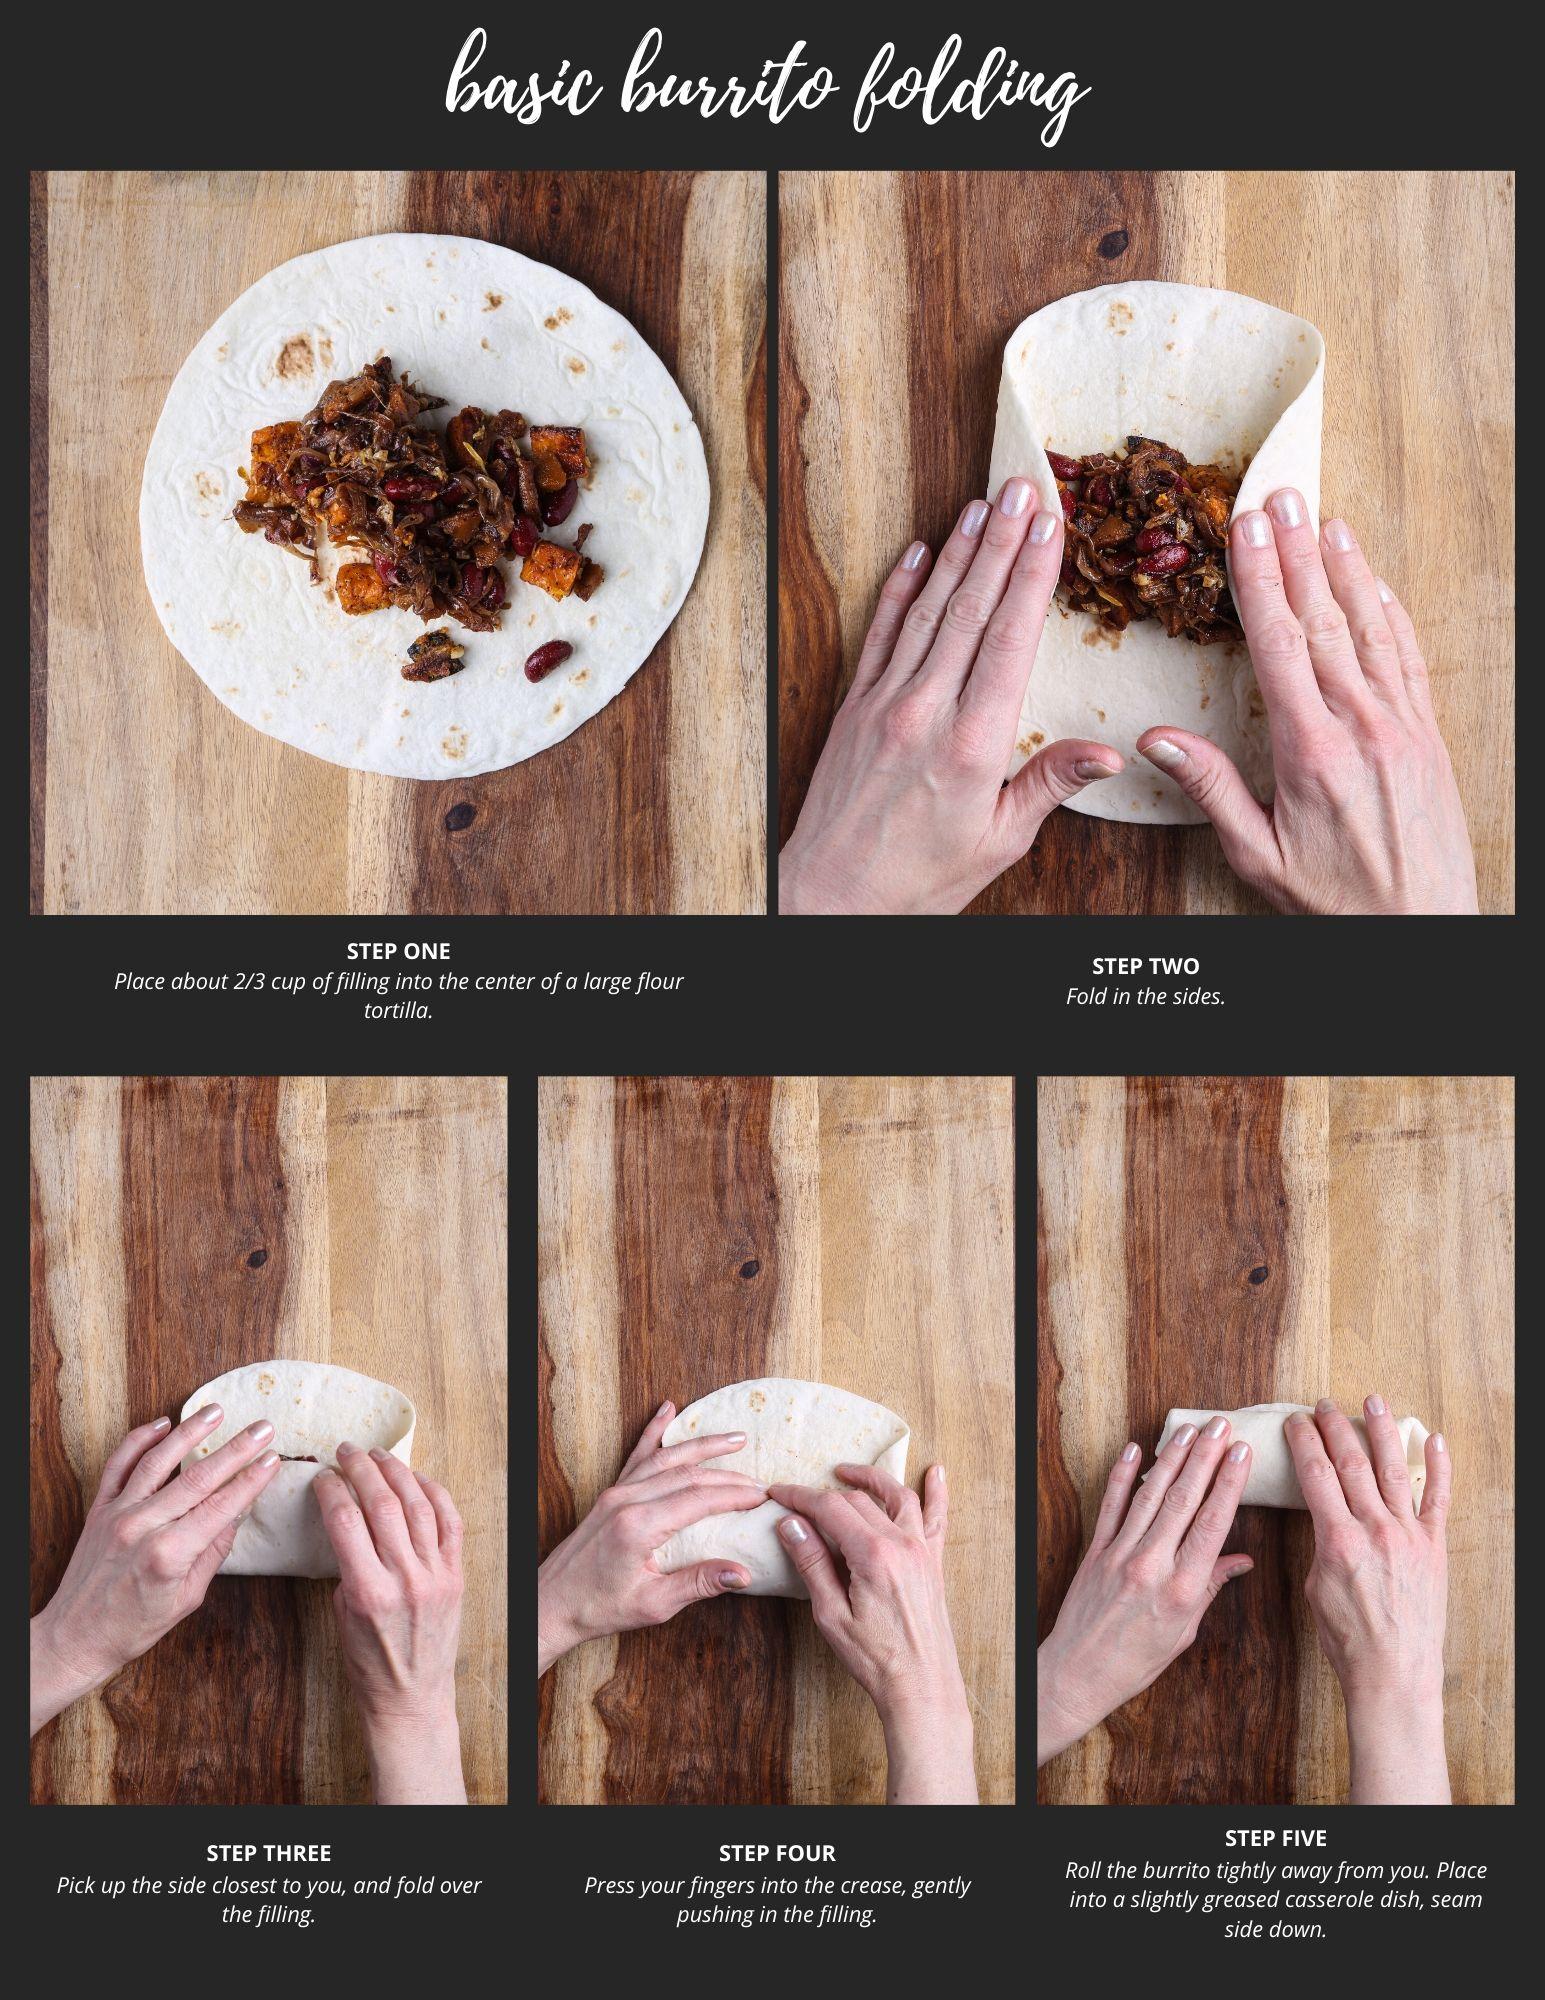 A tutorial on basic burrito folding